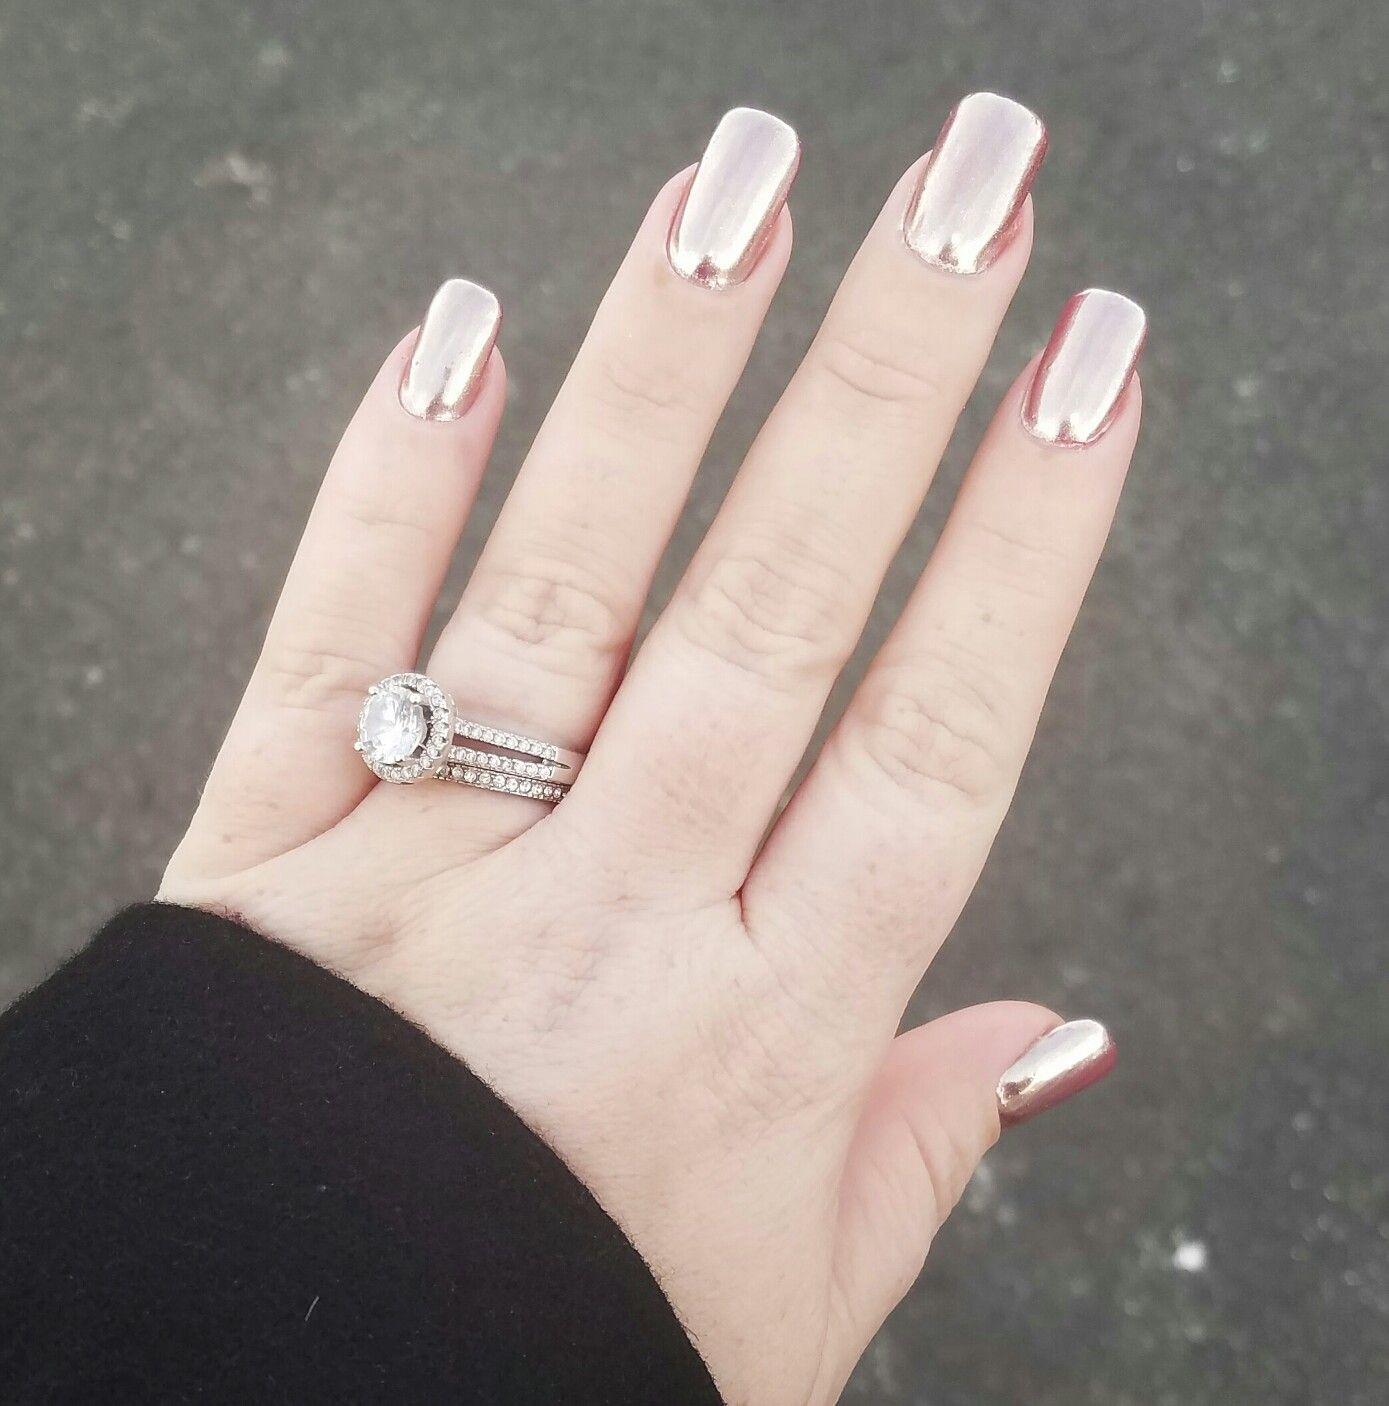 Chrome nails chrome powder rose gold bling ring ibd personal work ...